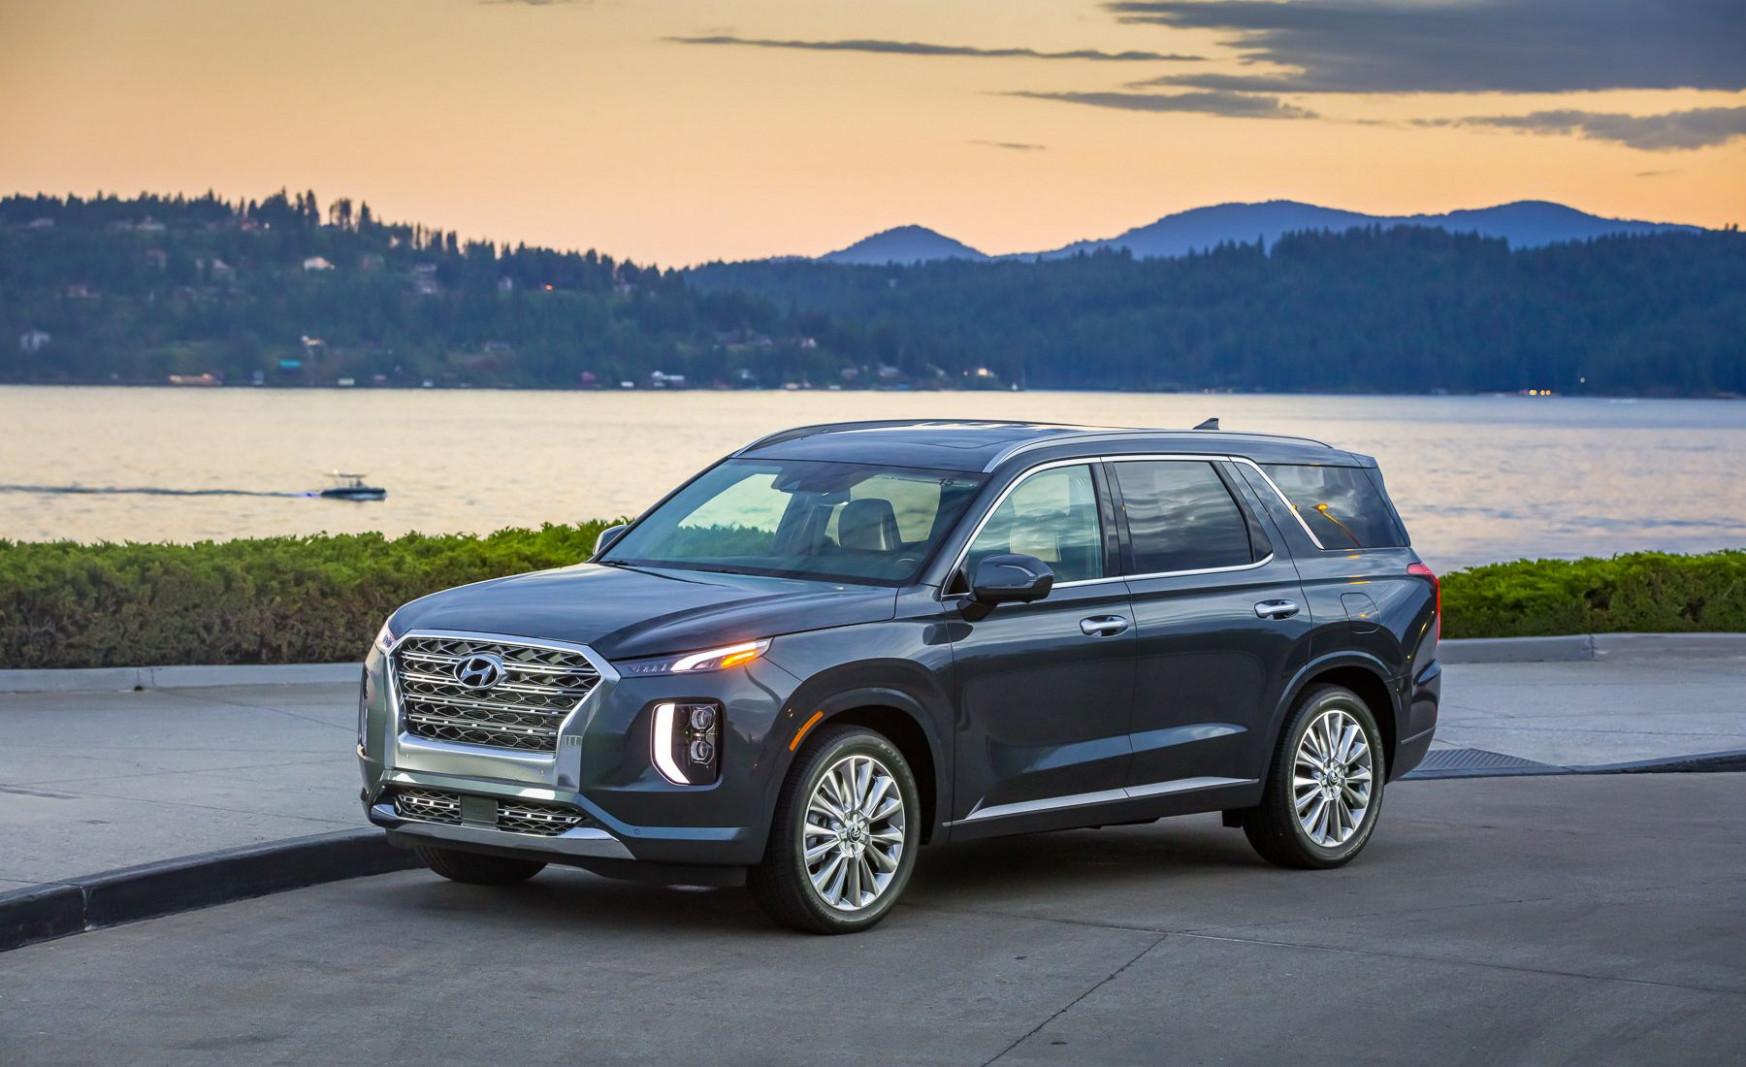 Model Price Of 2022 Hyundai Palisade